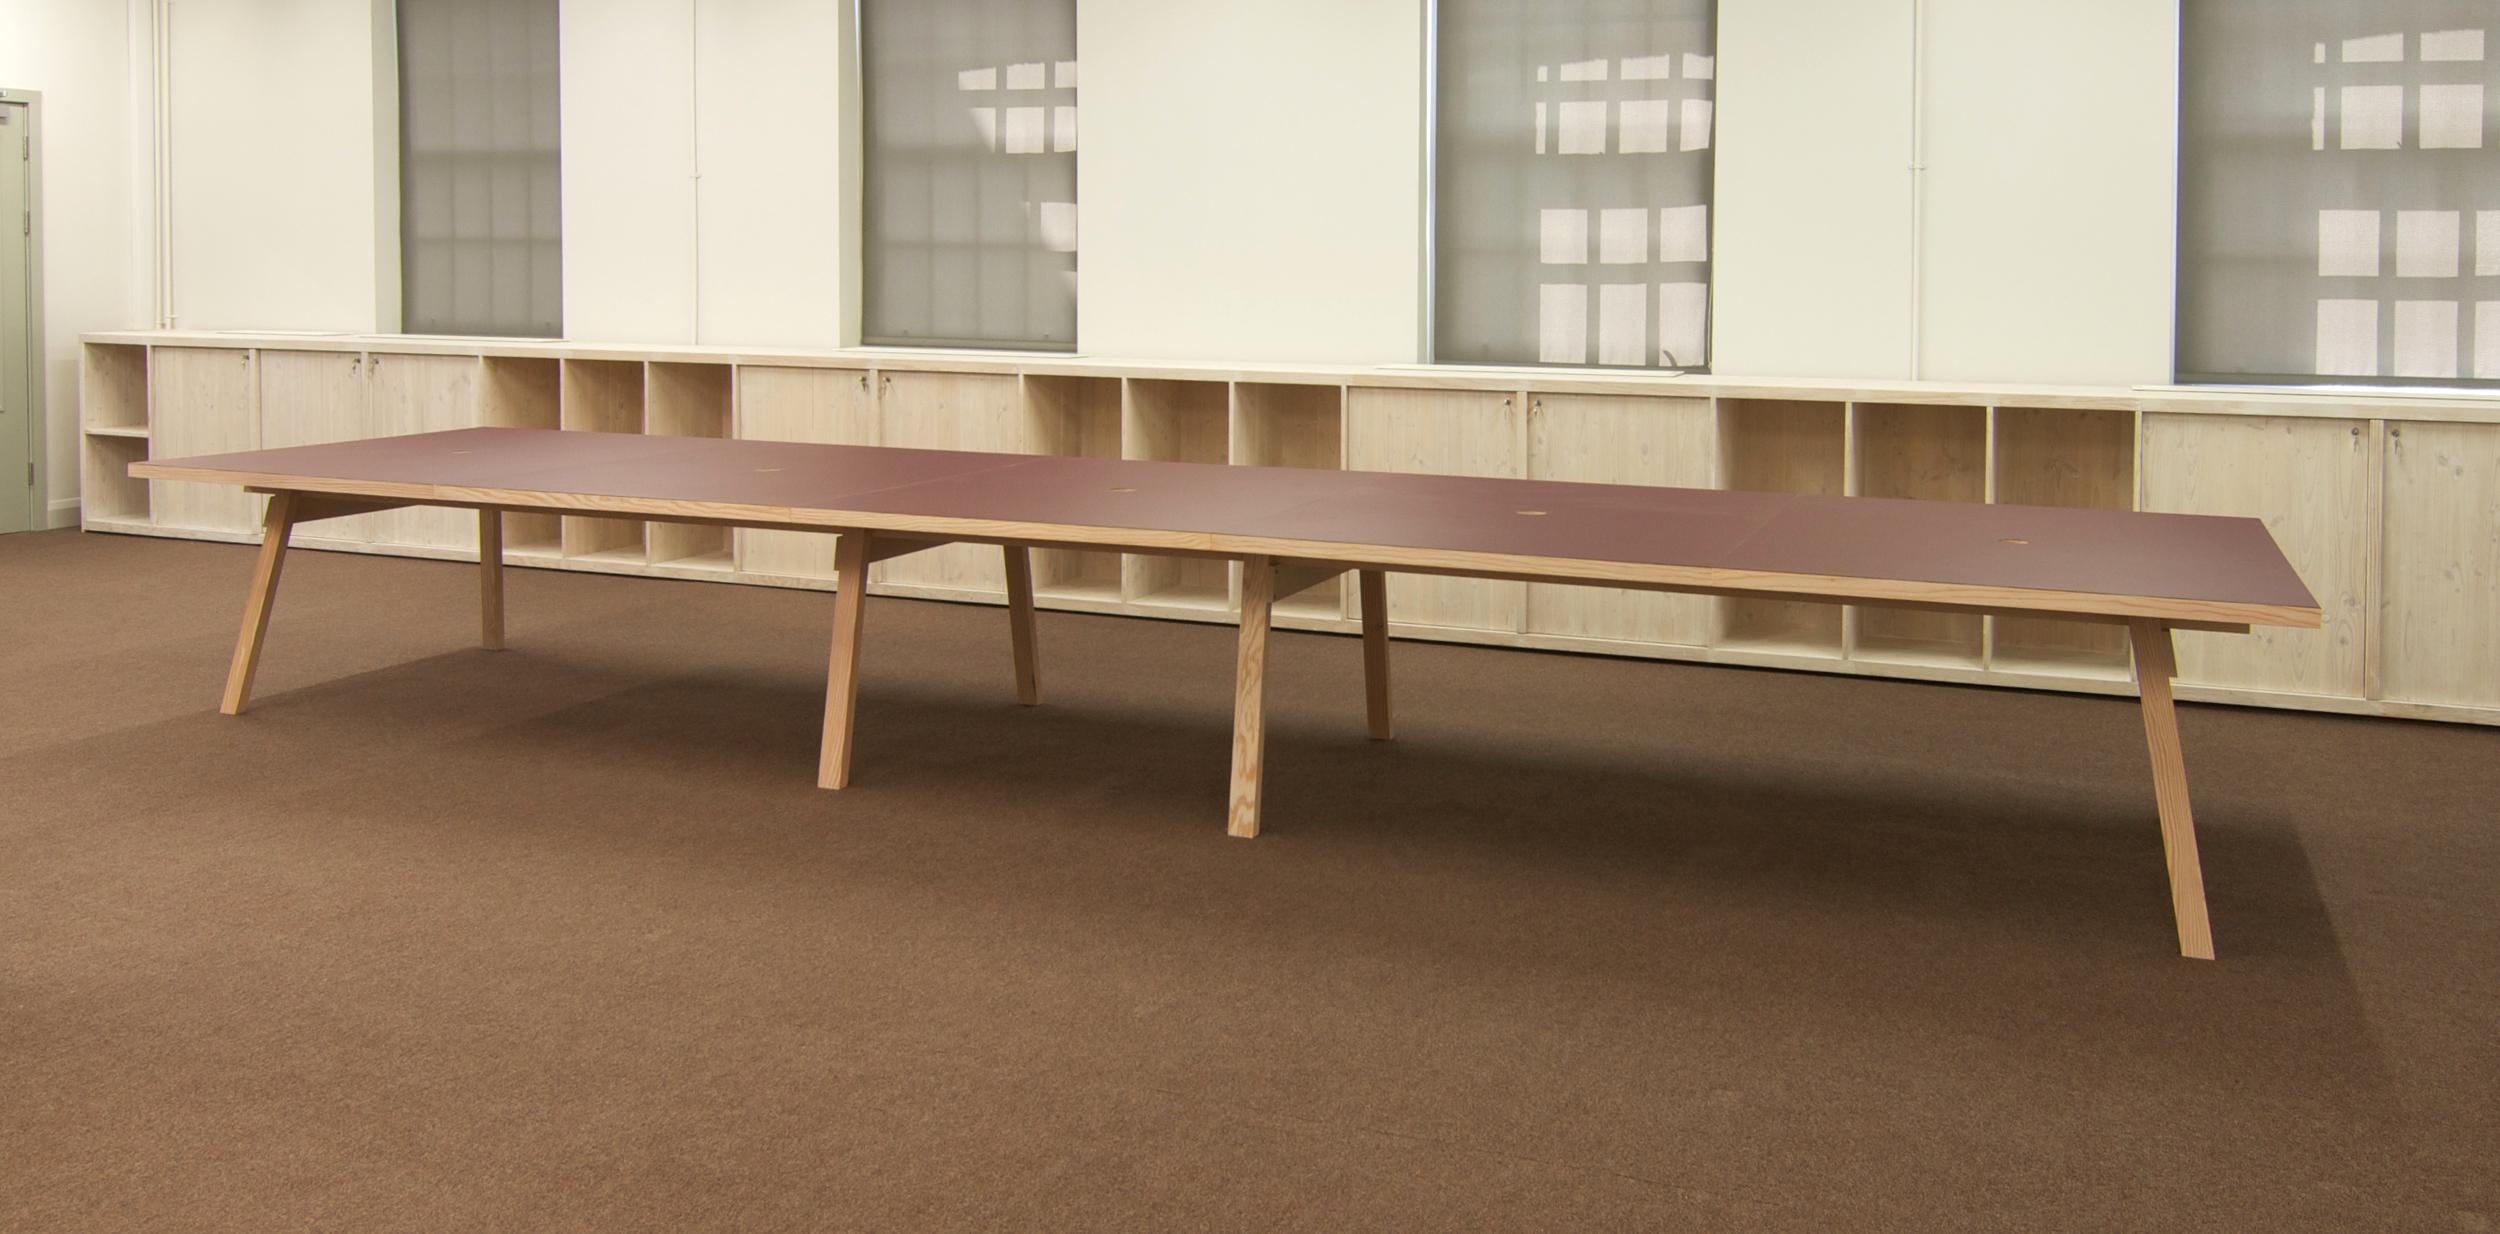 639 long work table